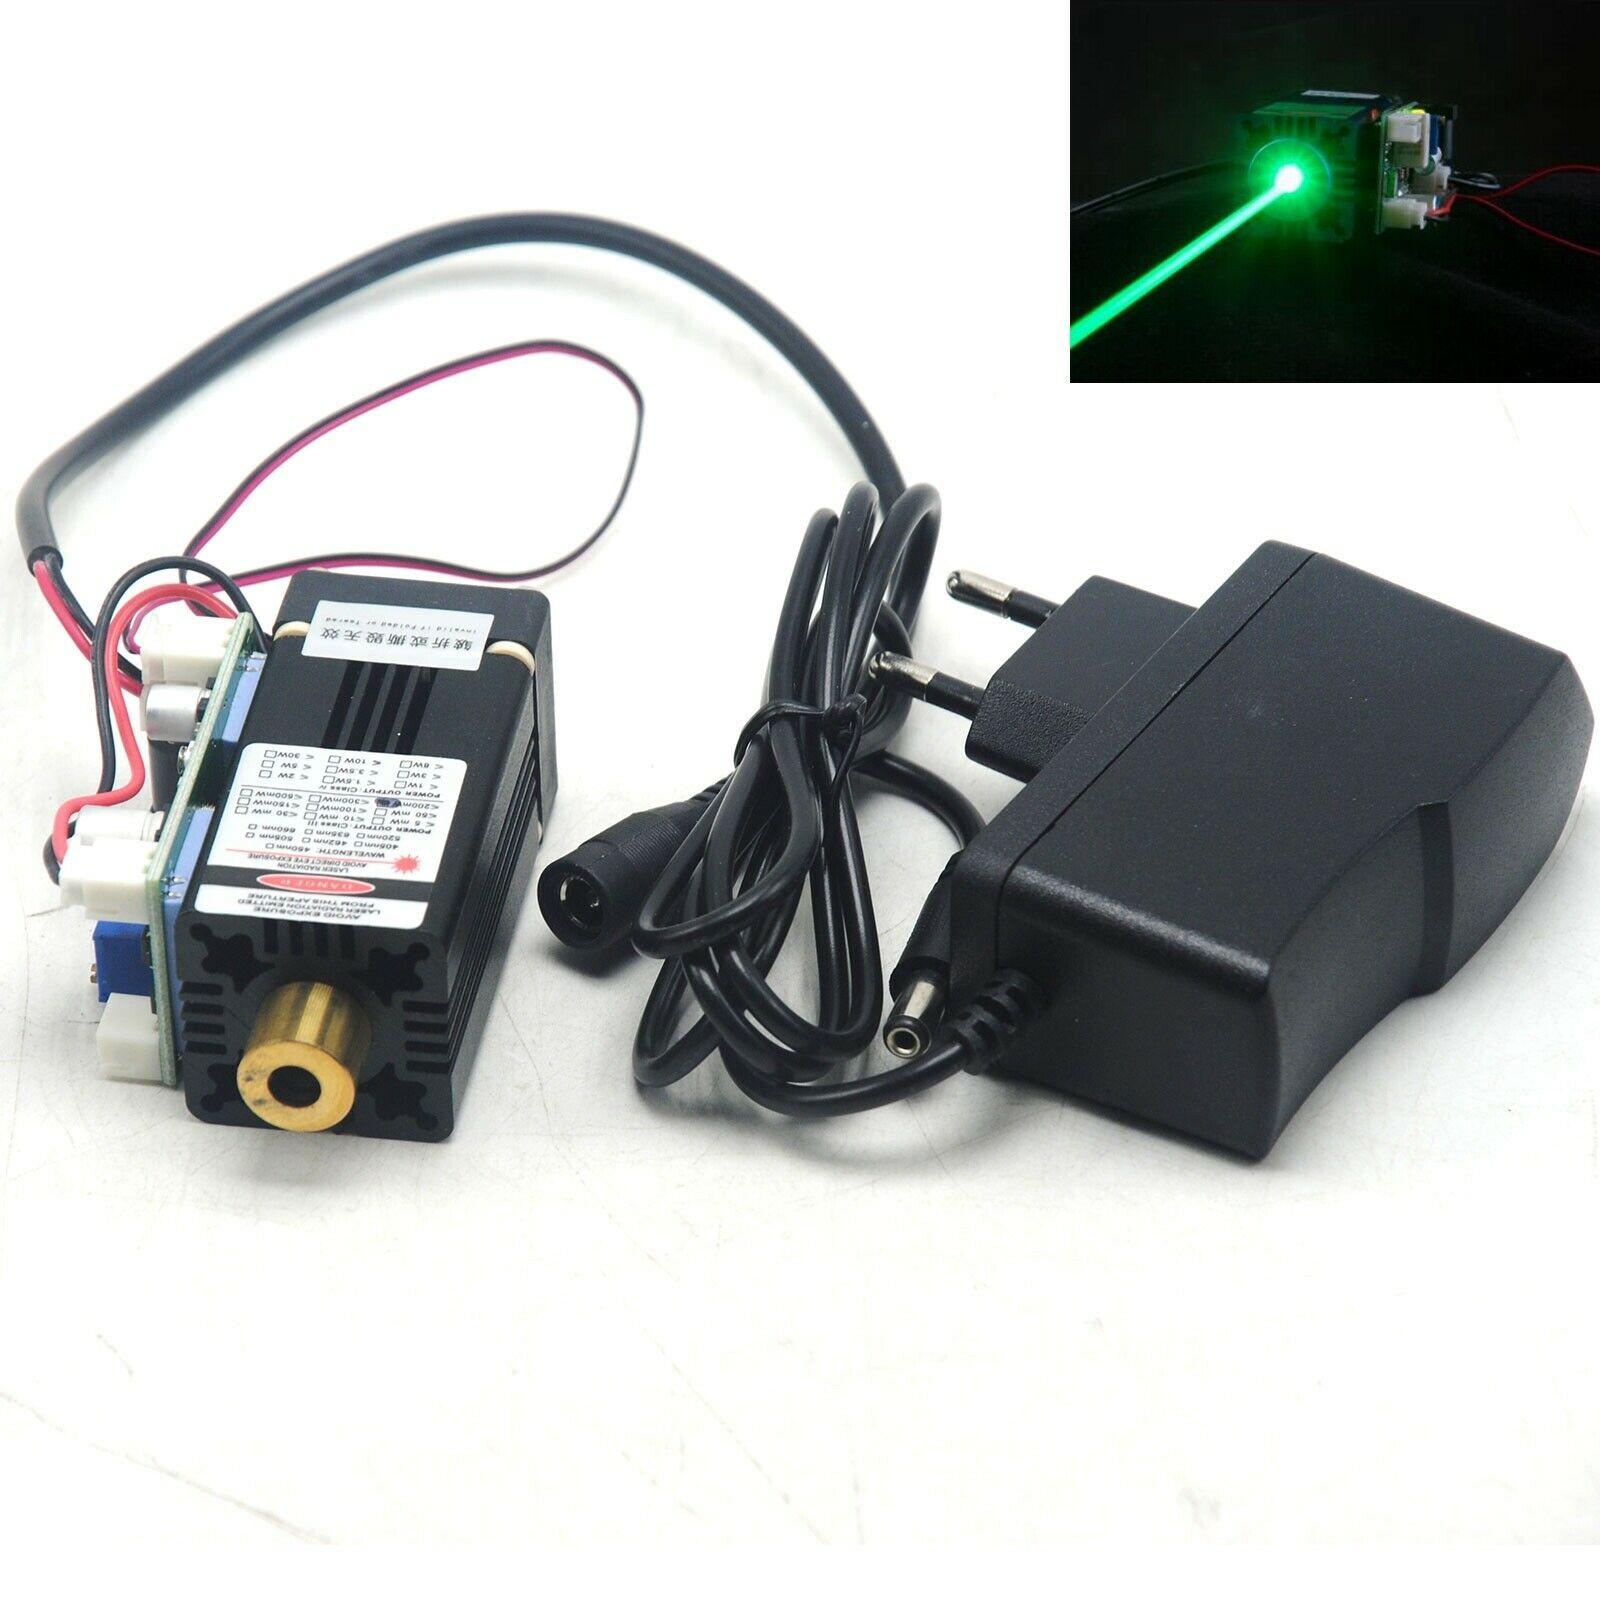 Focusable 515nm 520nm 100mW Dot Green Ray Laser Module Head w/12V Adapter & Fan